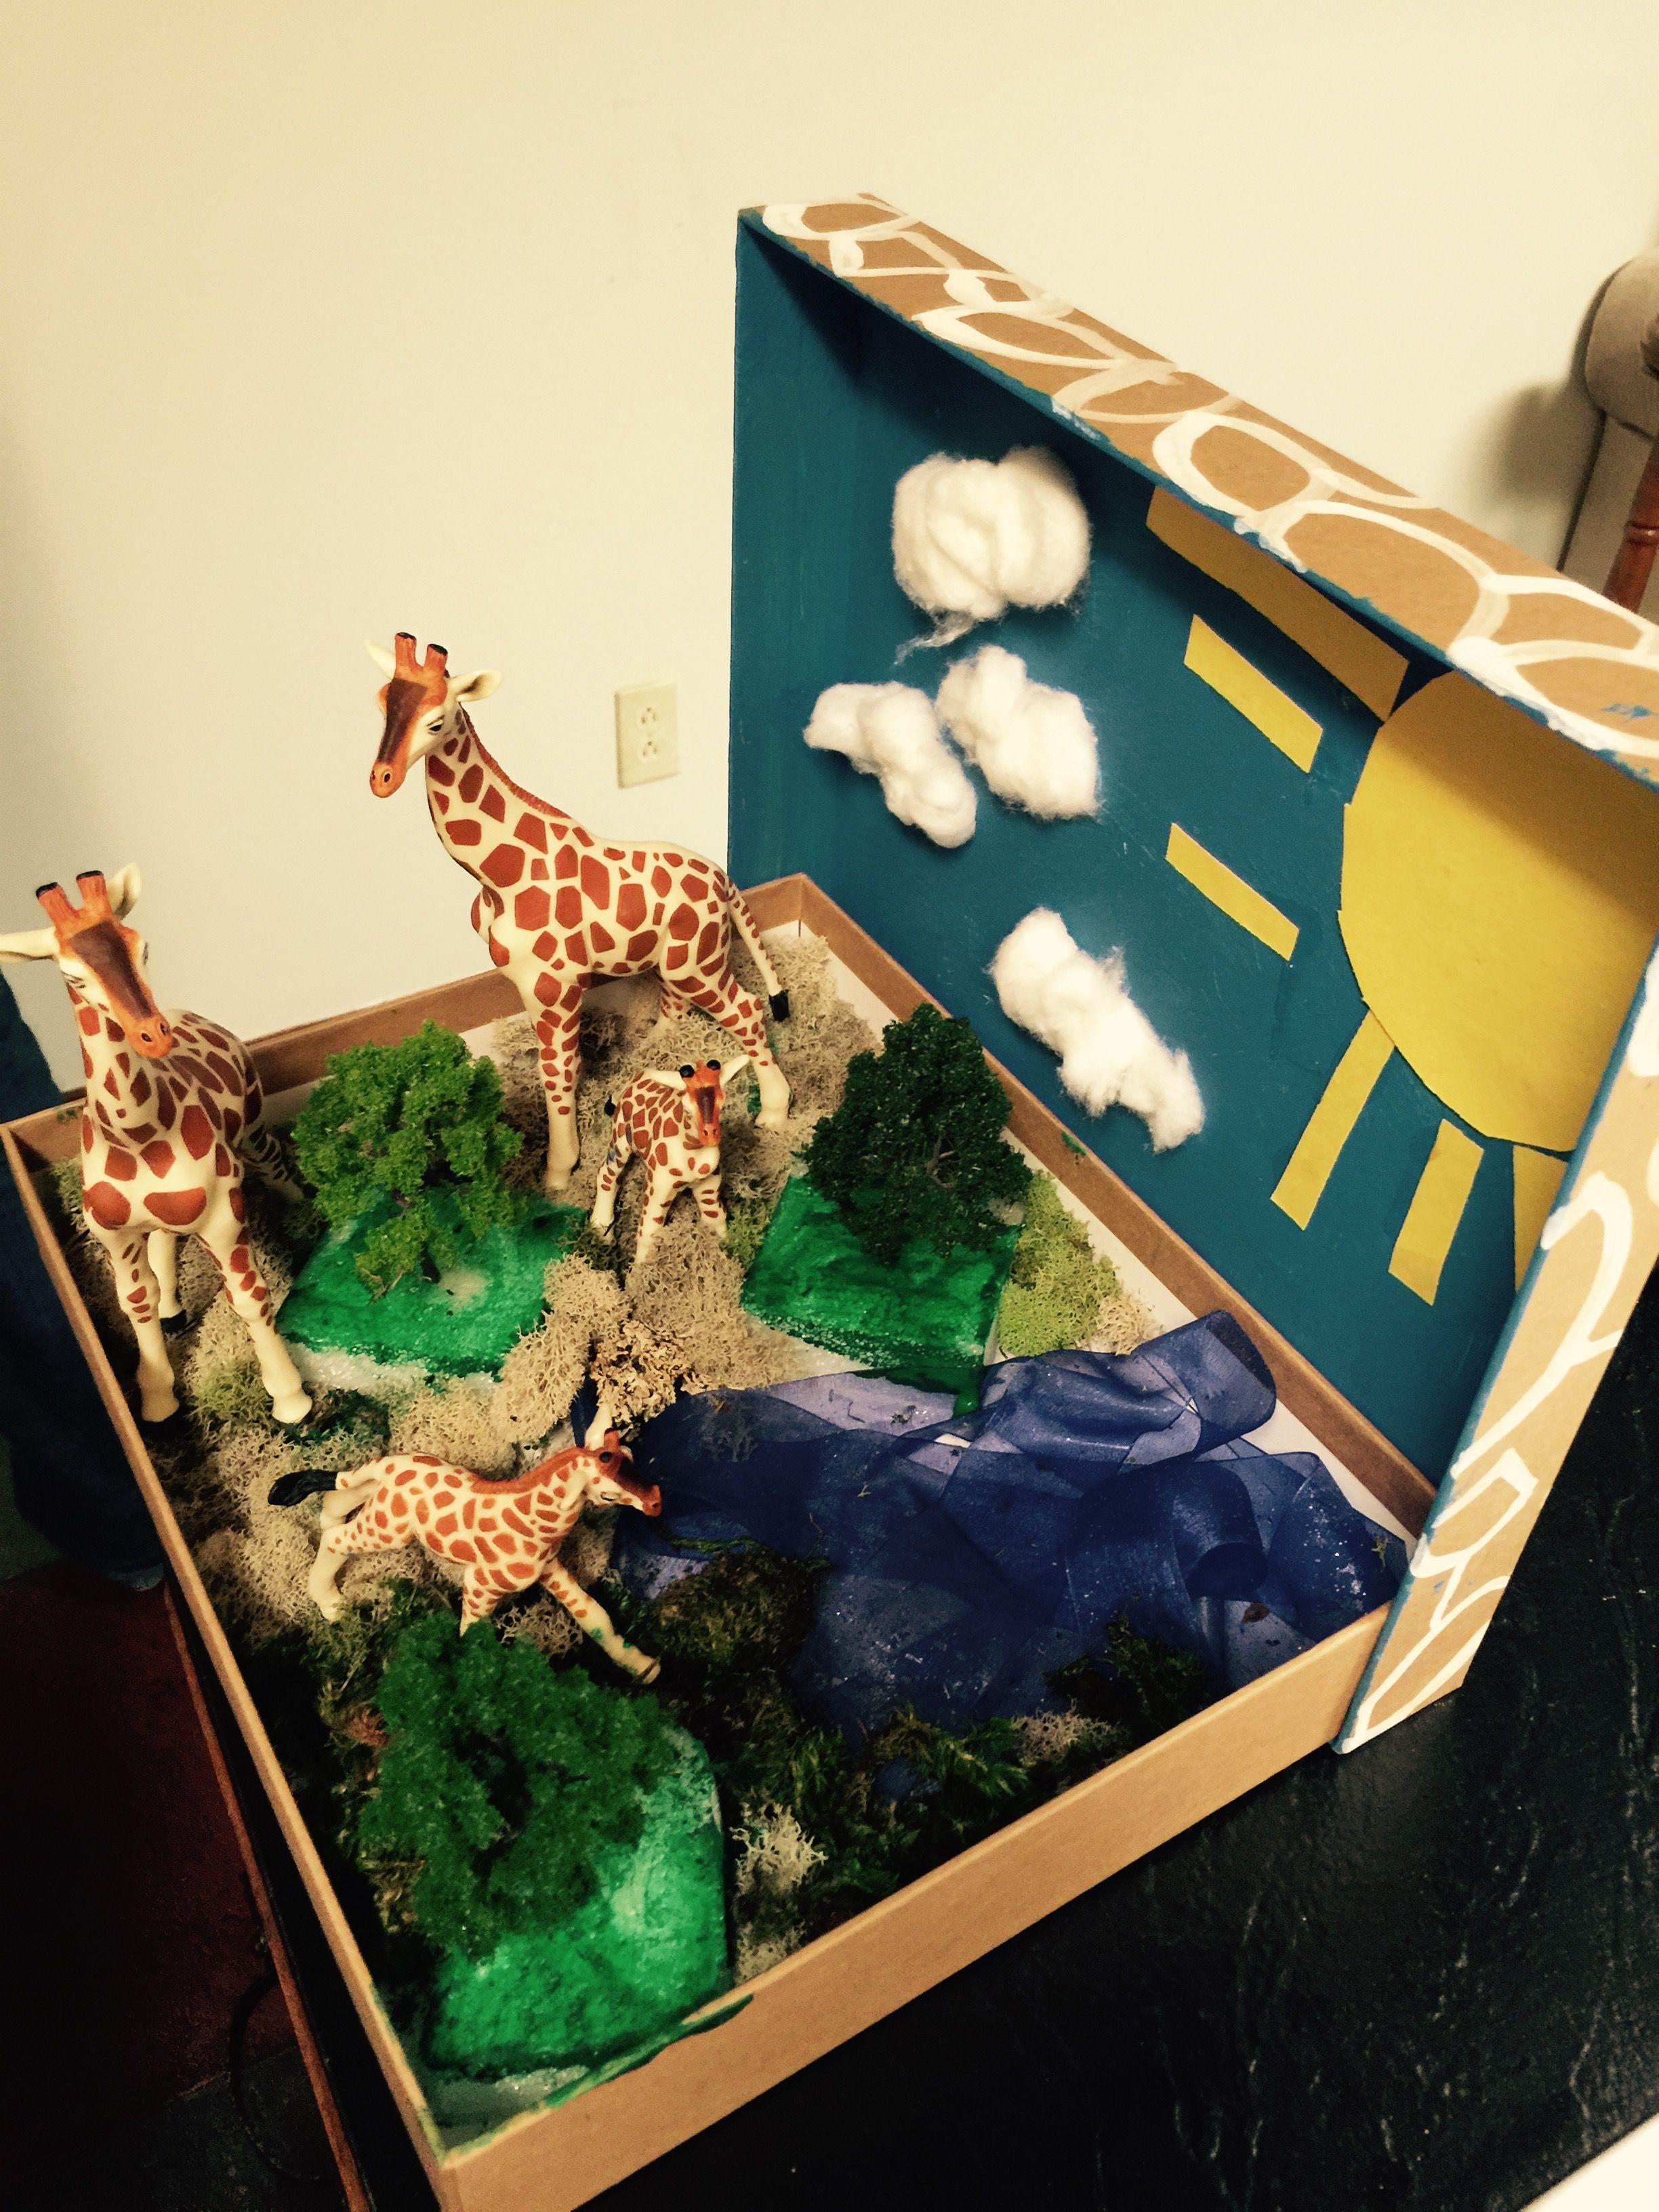 Pin By Dawn Marciano On Baby Giraffe Habitat